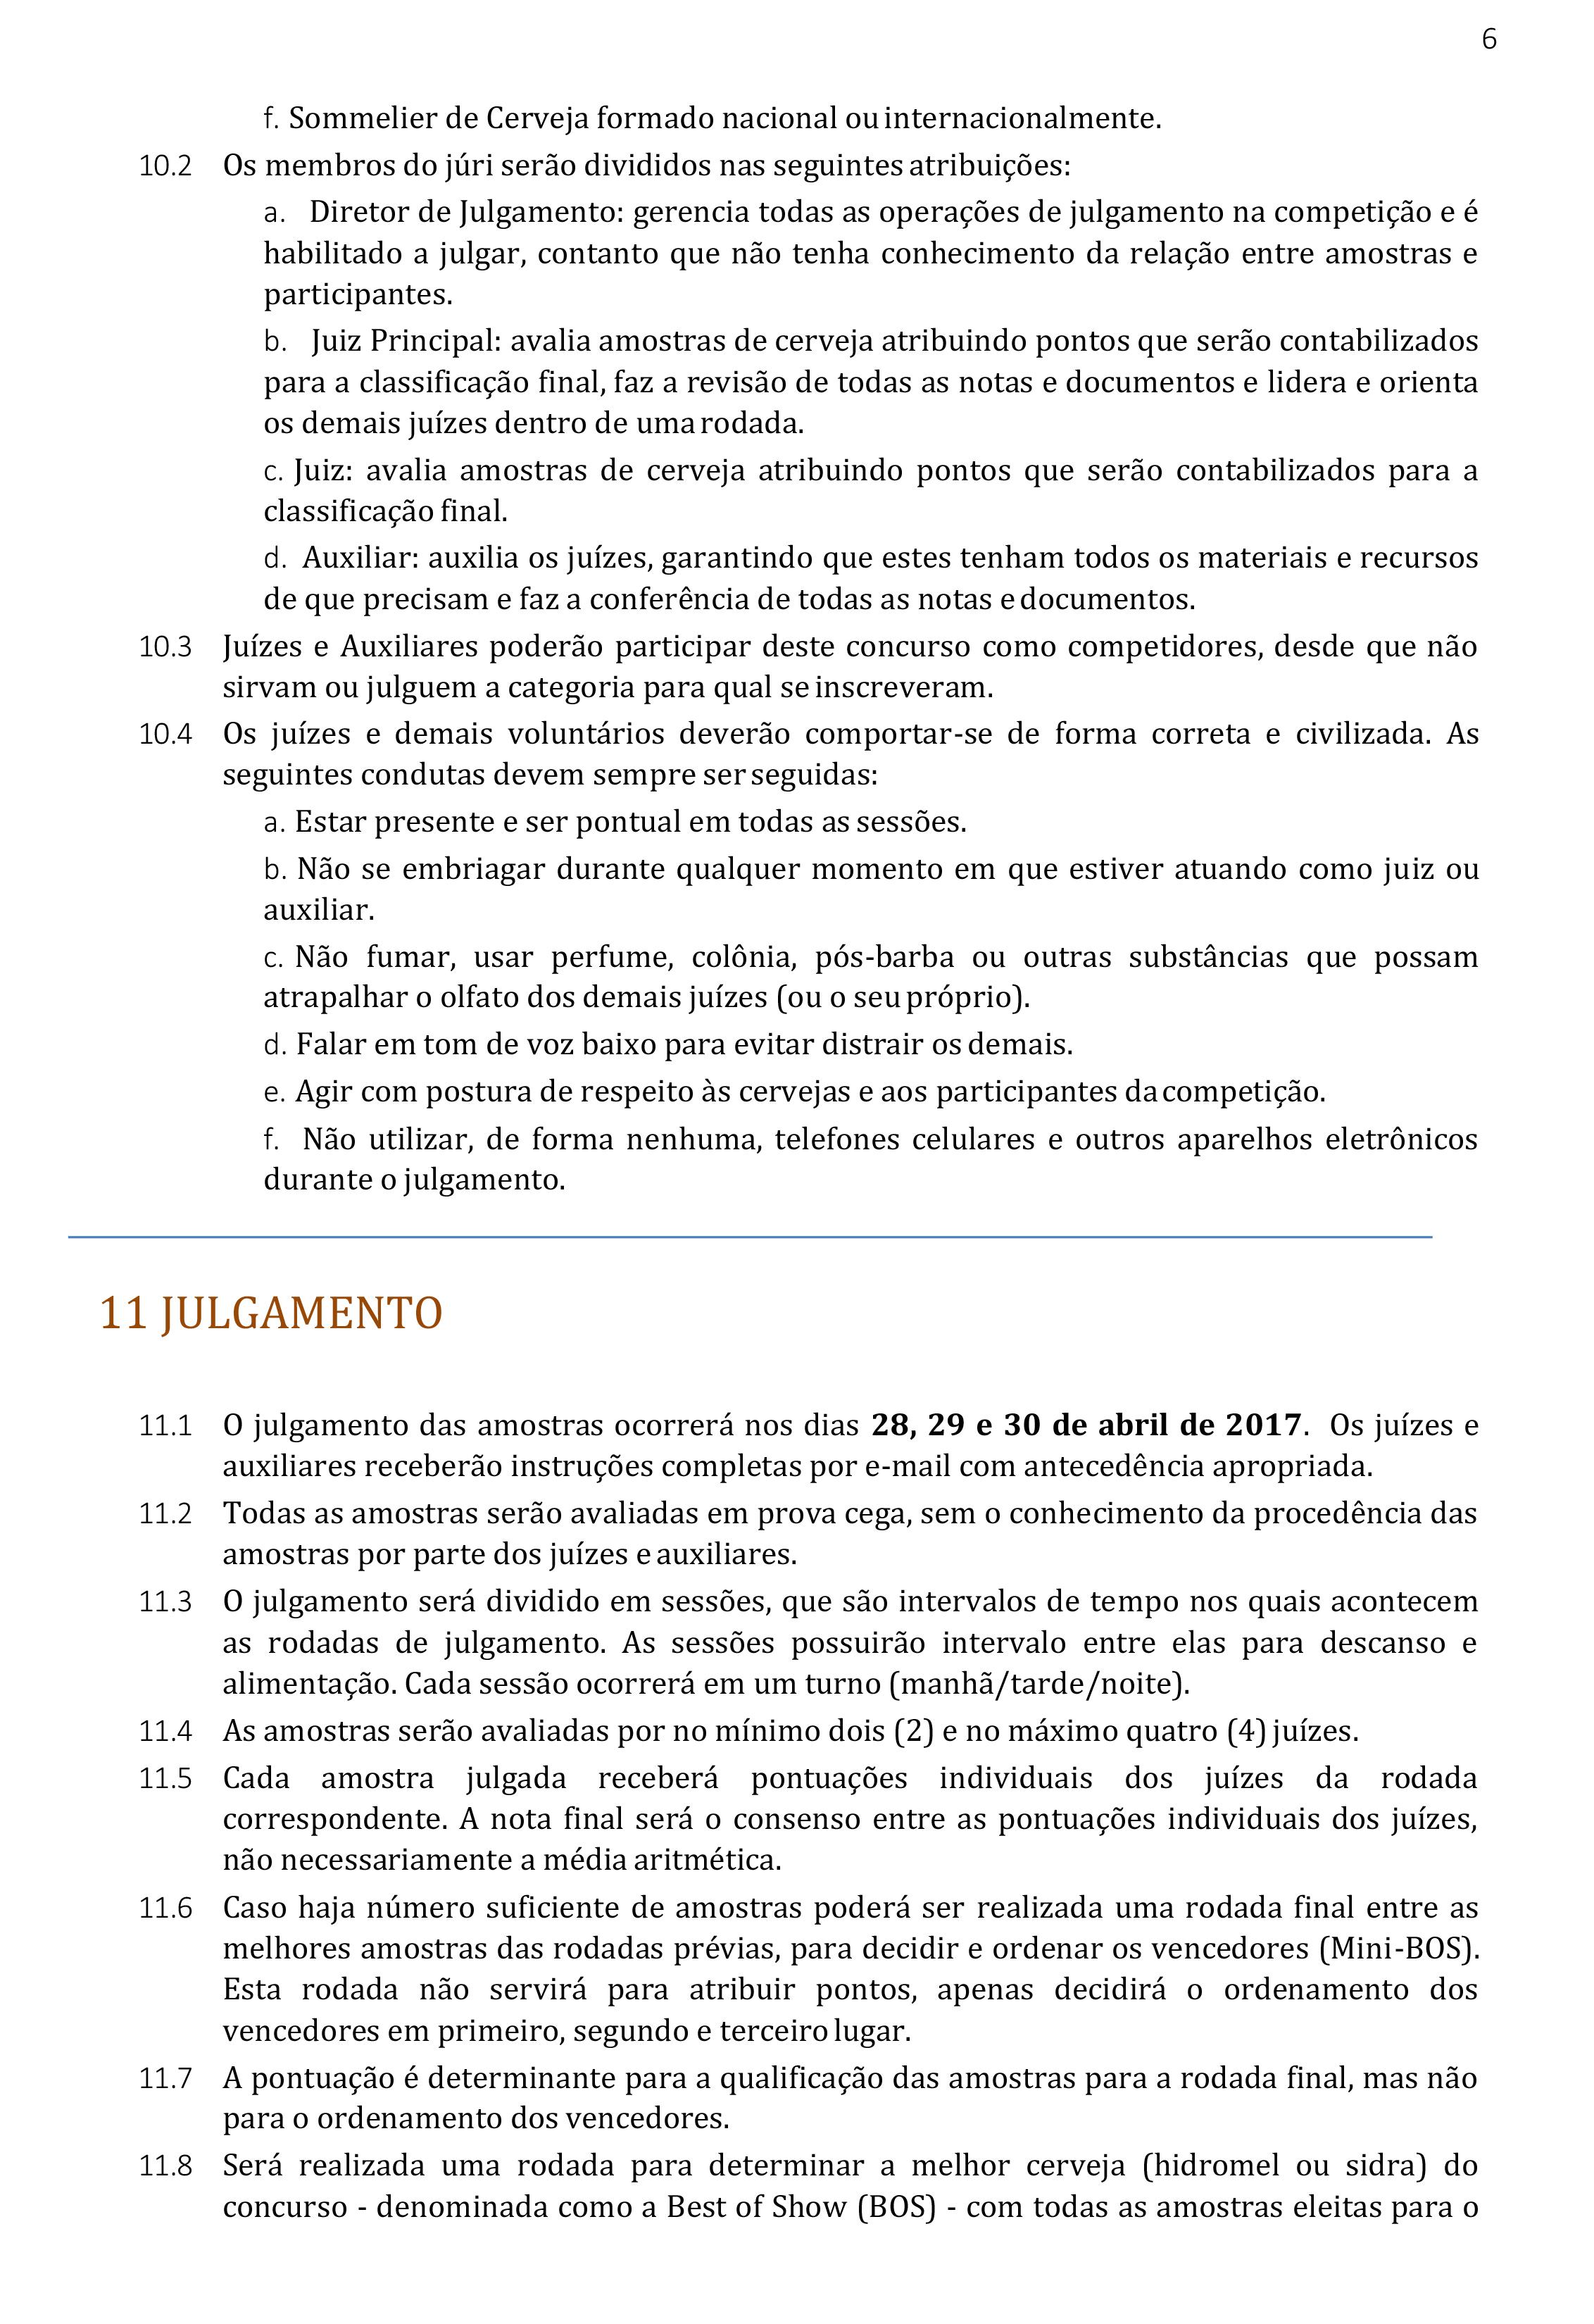 IV Concurso Sulbrasileiro 2017-Regulamento-6.jpg